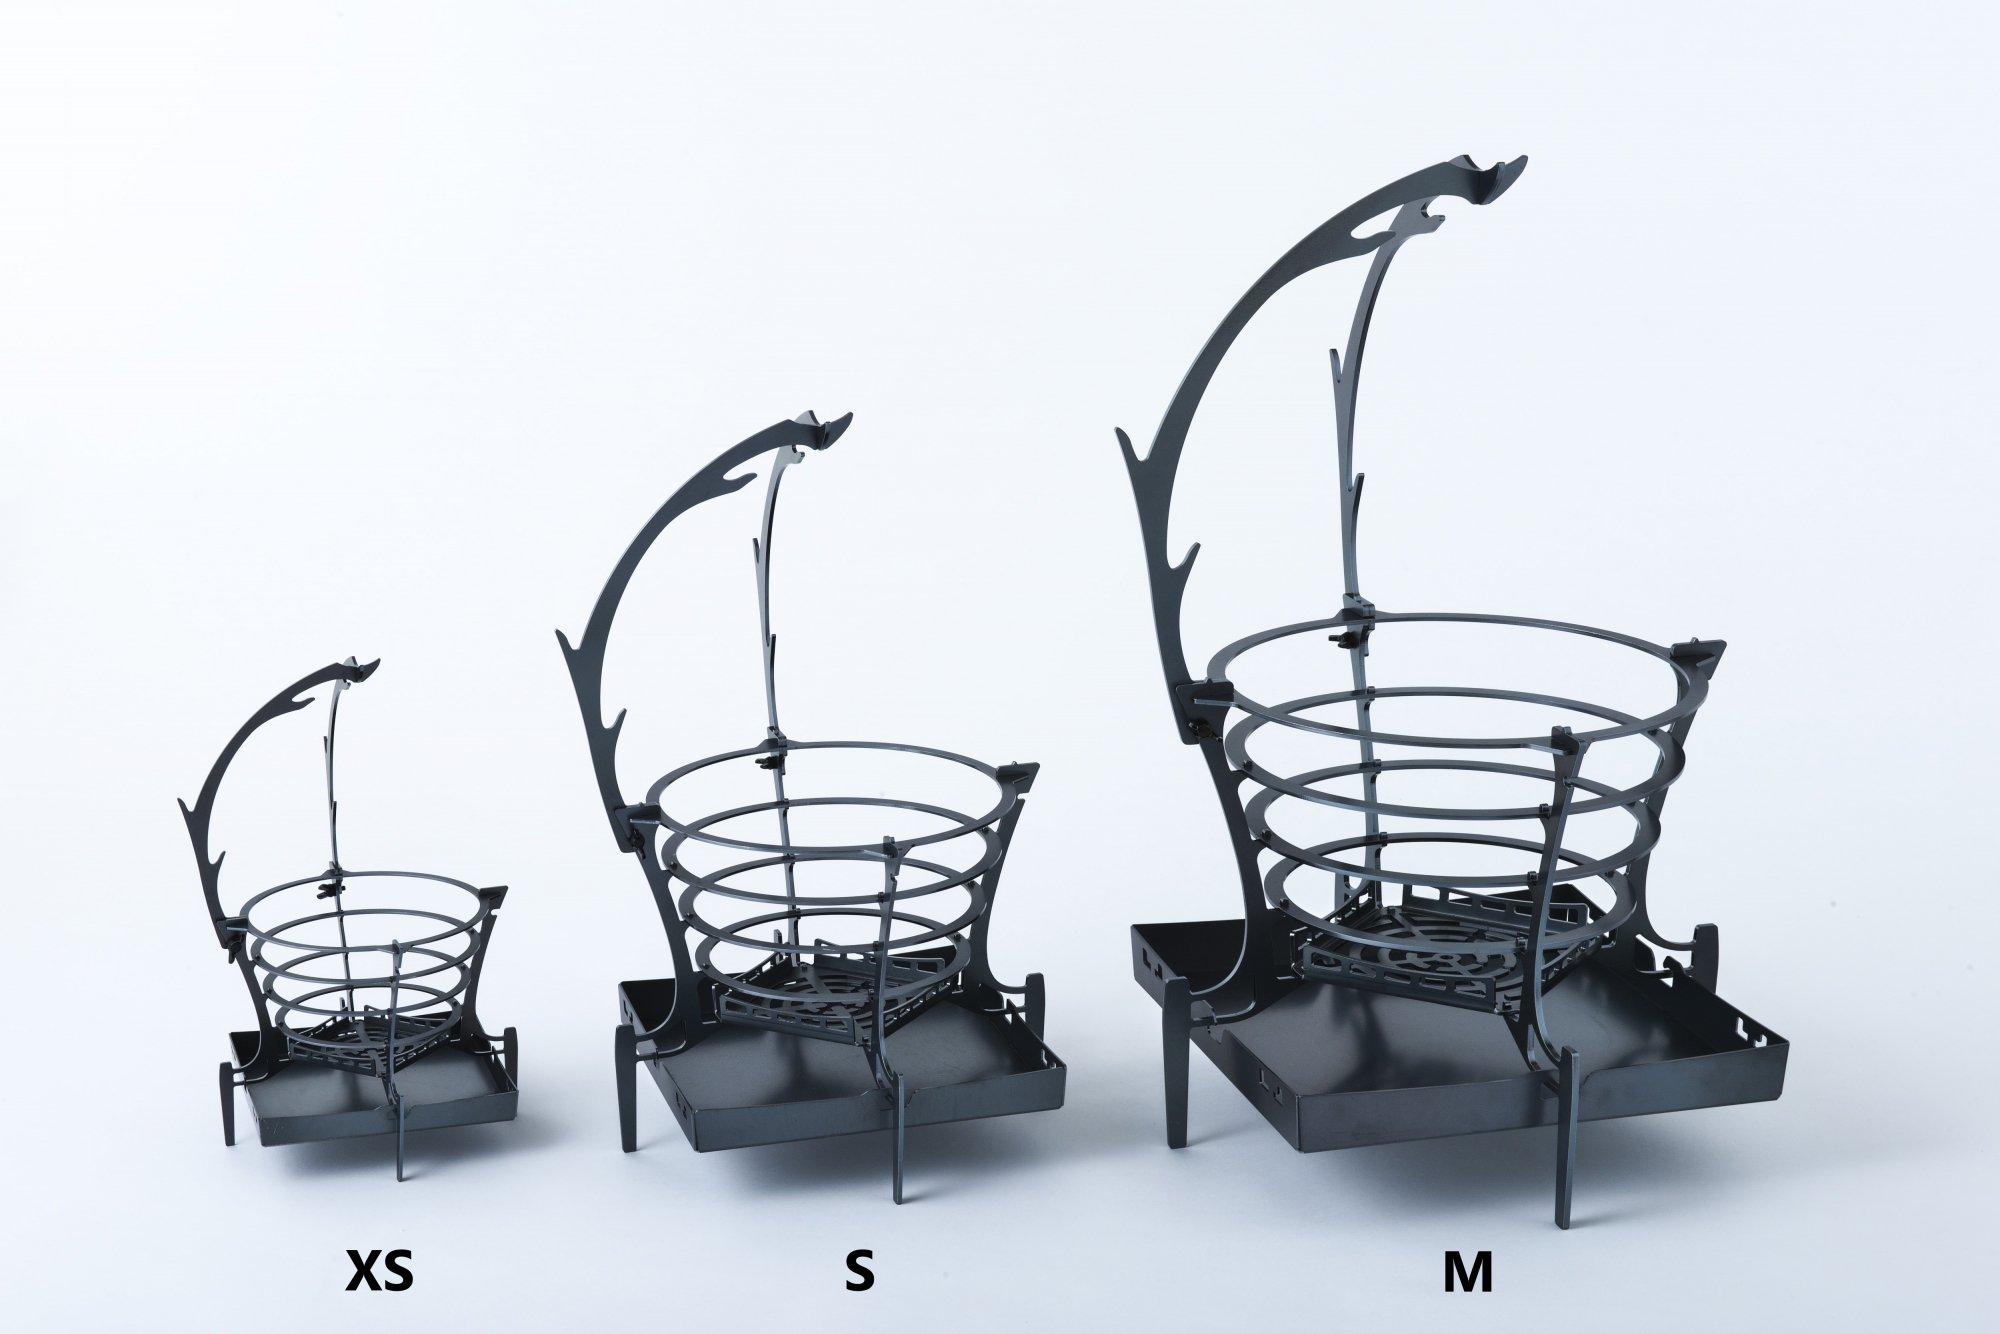 GURU GURU FIRE  XS / グルグルファイヤー XS